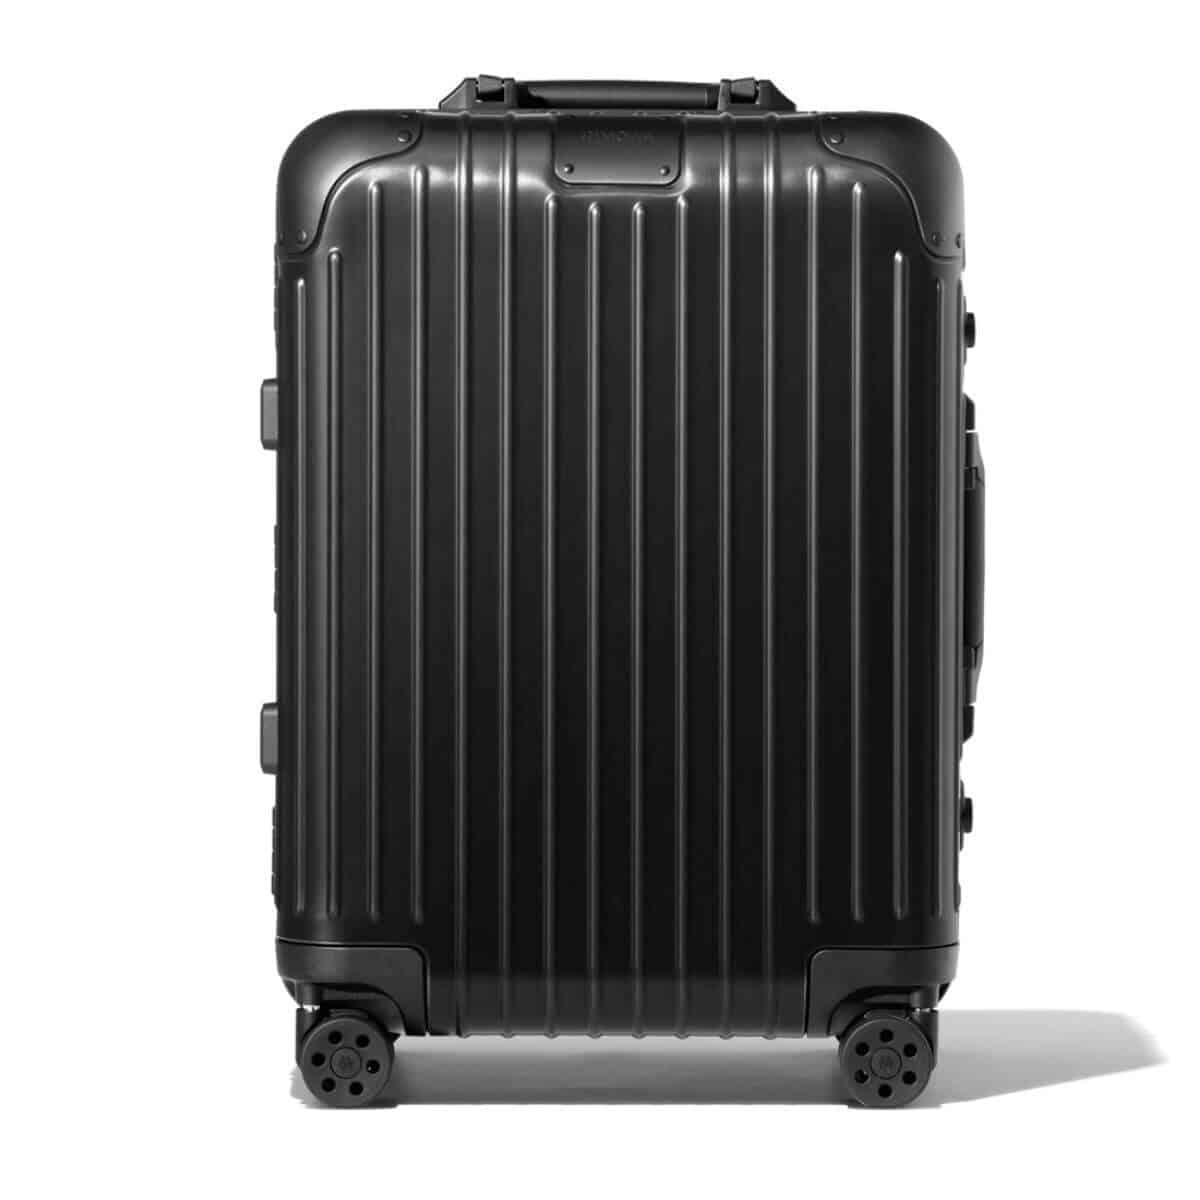 Black Rimowa carry-on luggage.